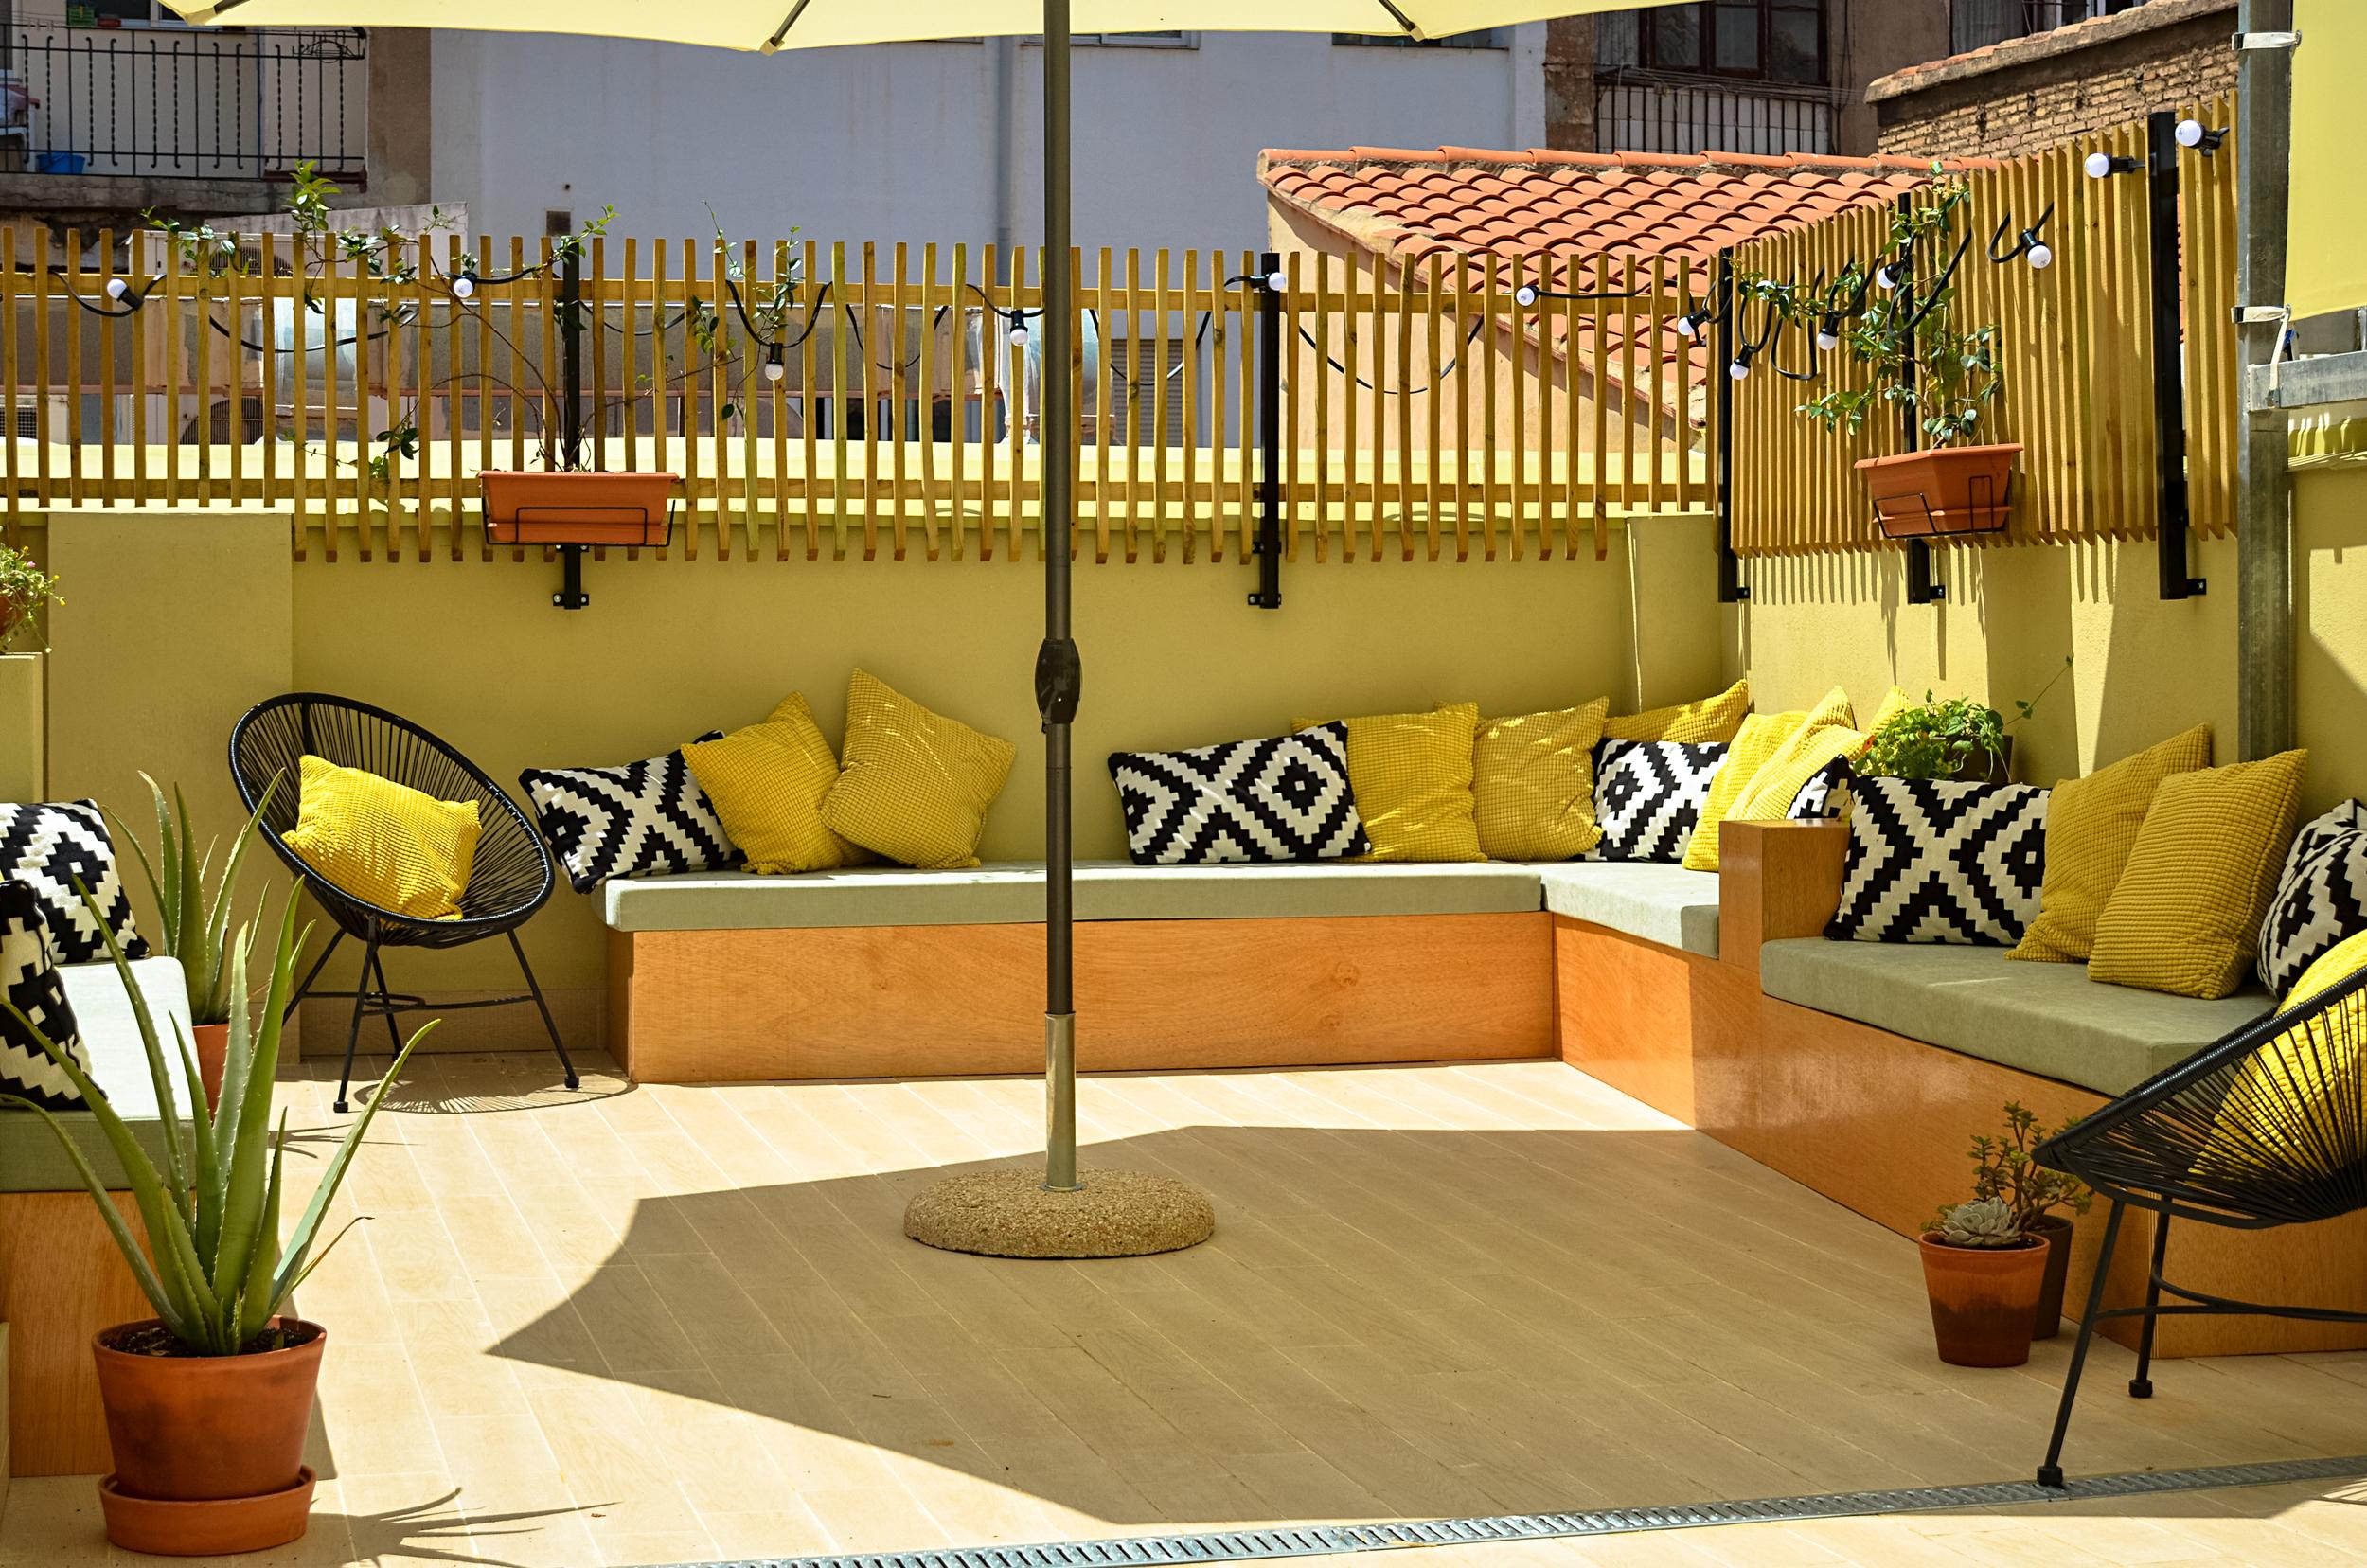 Terrace of Zalamera B&B in Valencia, Spain (61 of 92).jpg